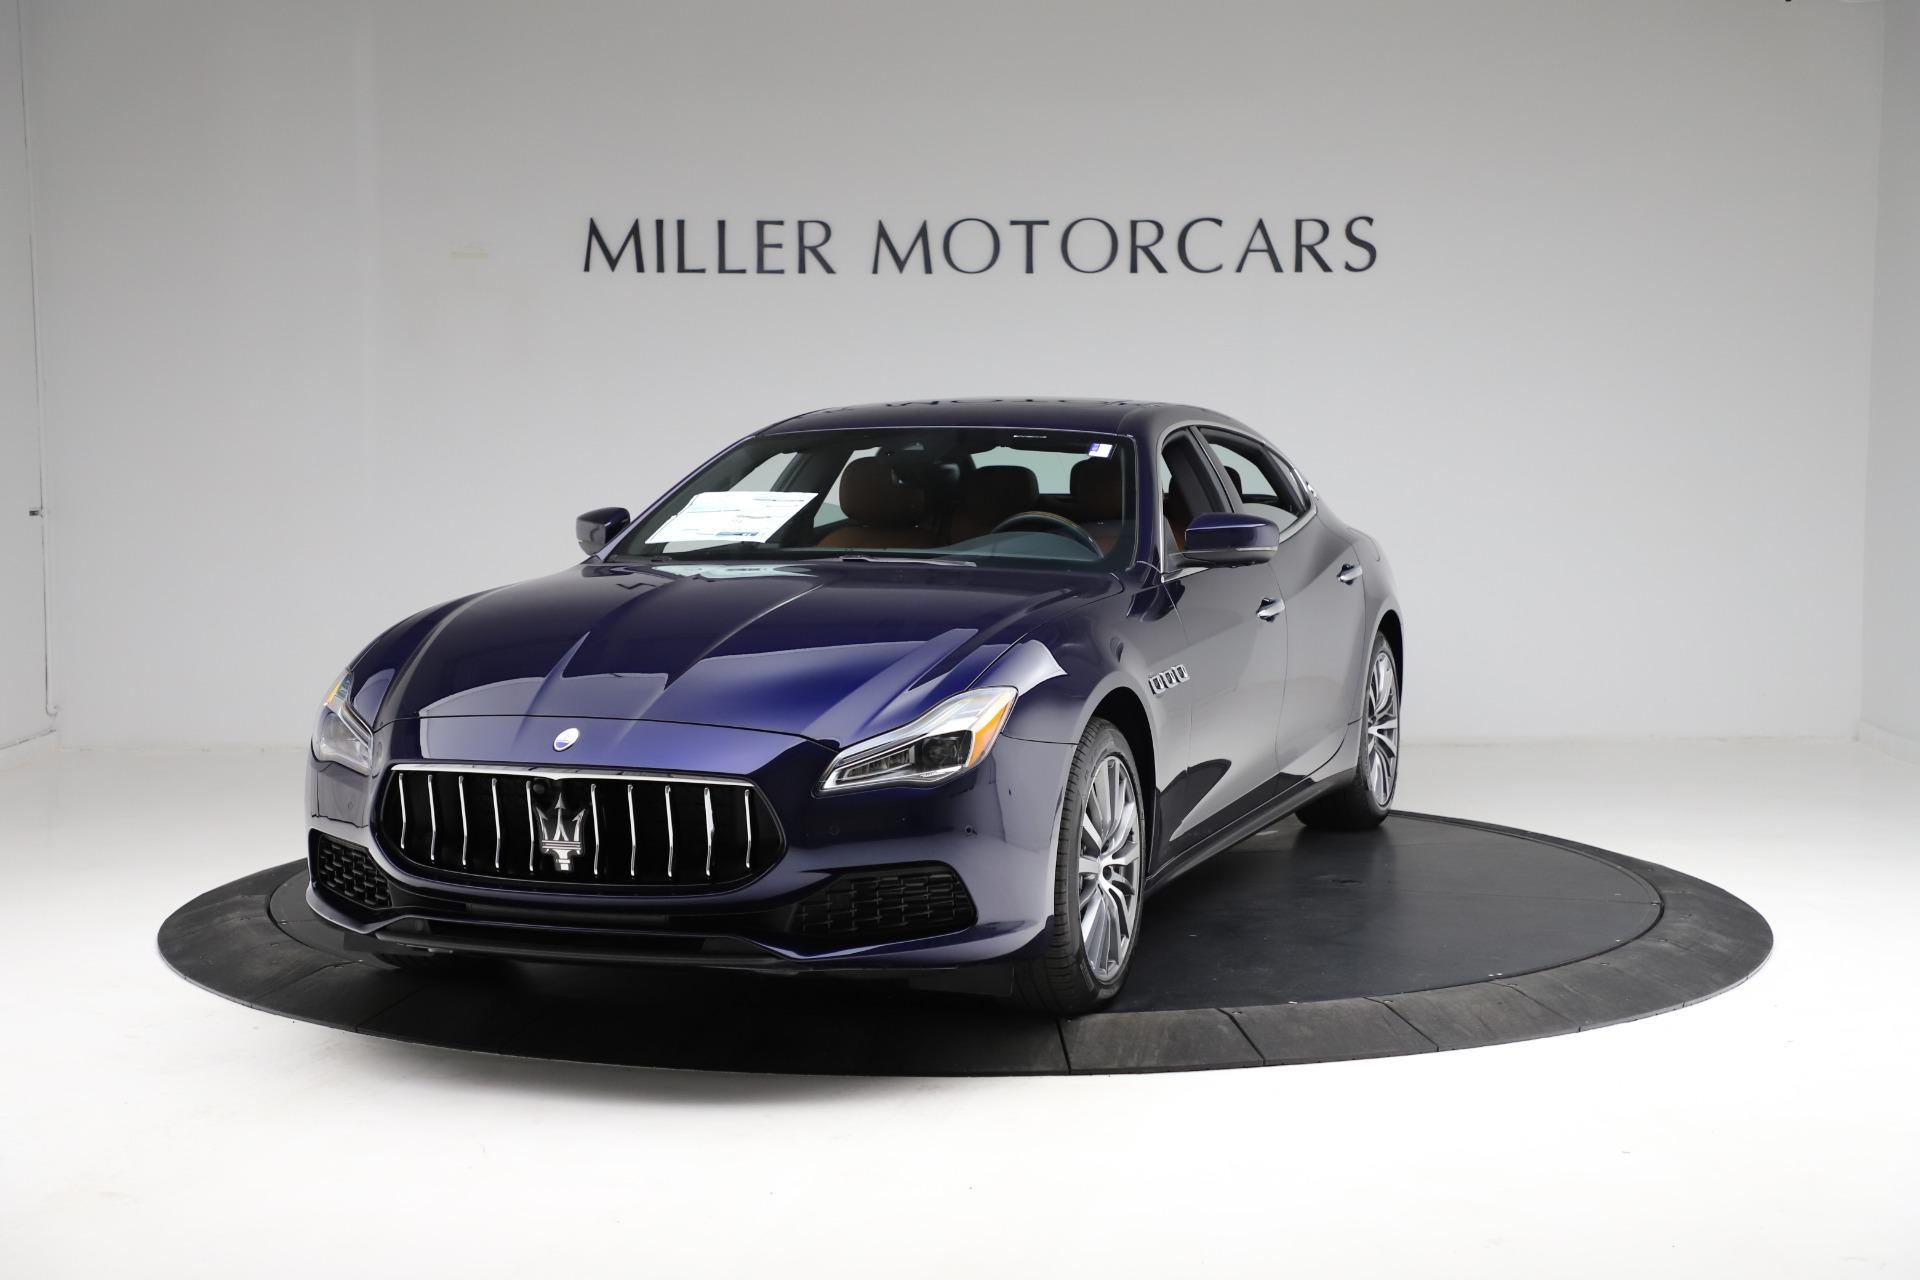 New 2021 Maserati Quattroporte S Q4 for sale Call for price at Pagani of Greenwich in Greenwich CT 06830 1